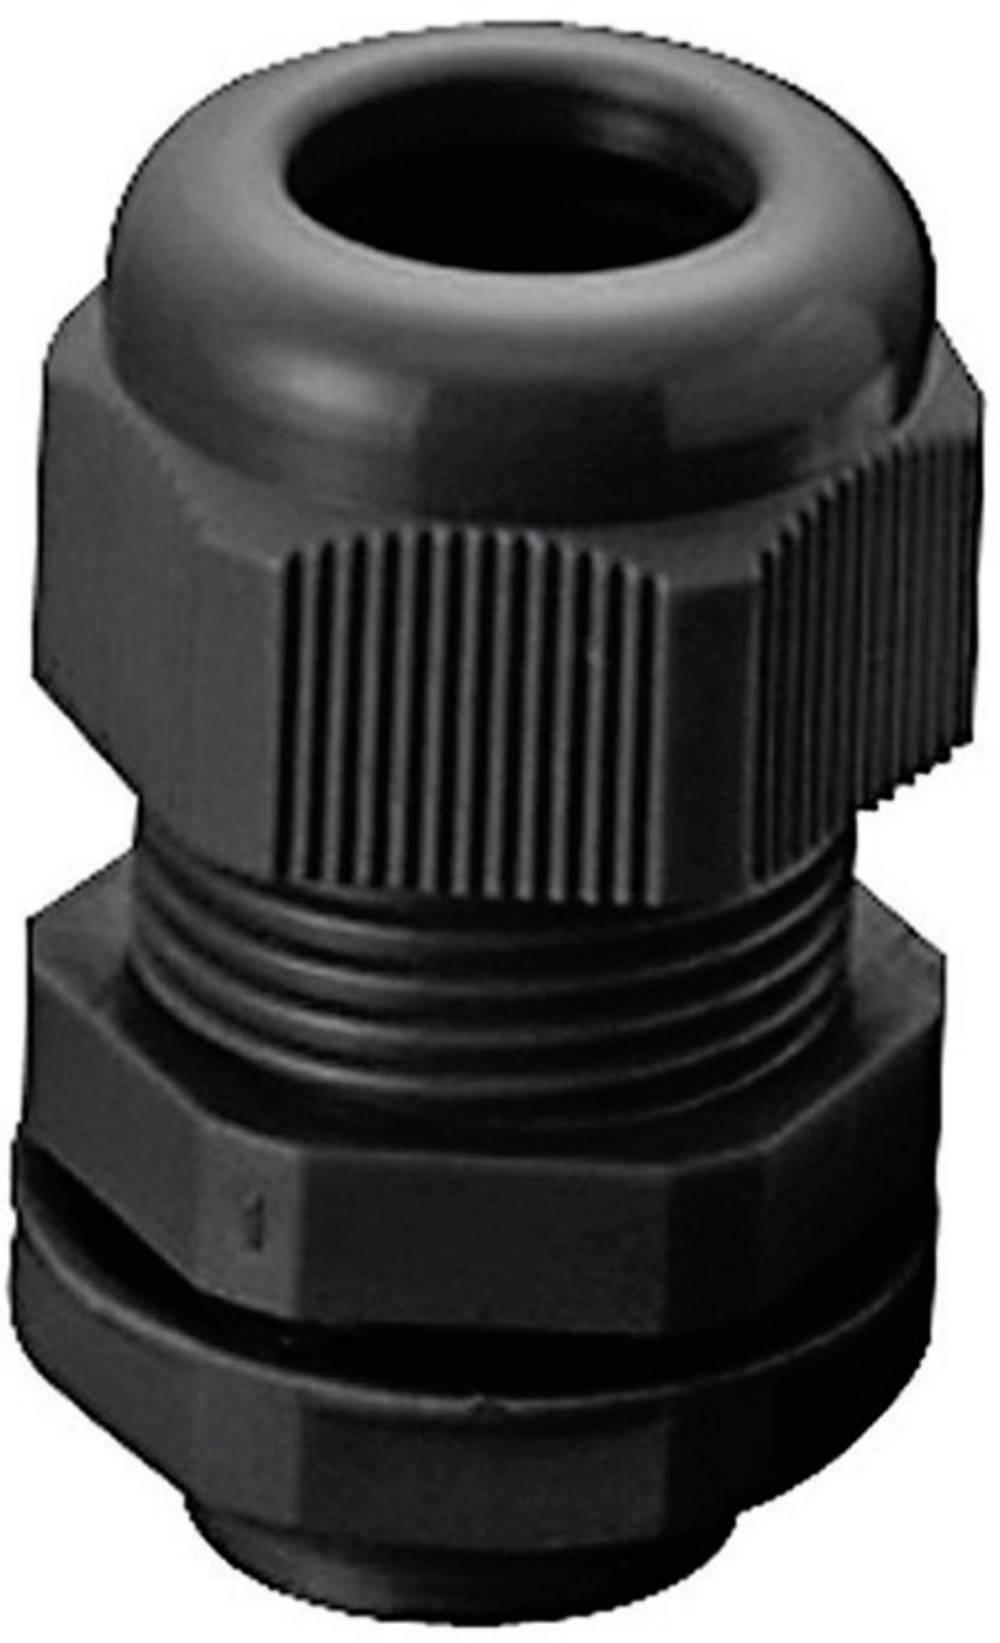 Kabelforskruning KSS AGR20 M20 Polyamid Sort (RAL 9005) 1 stk